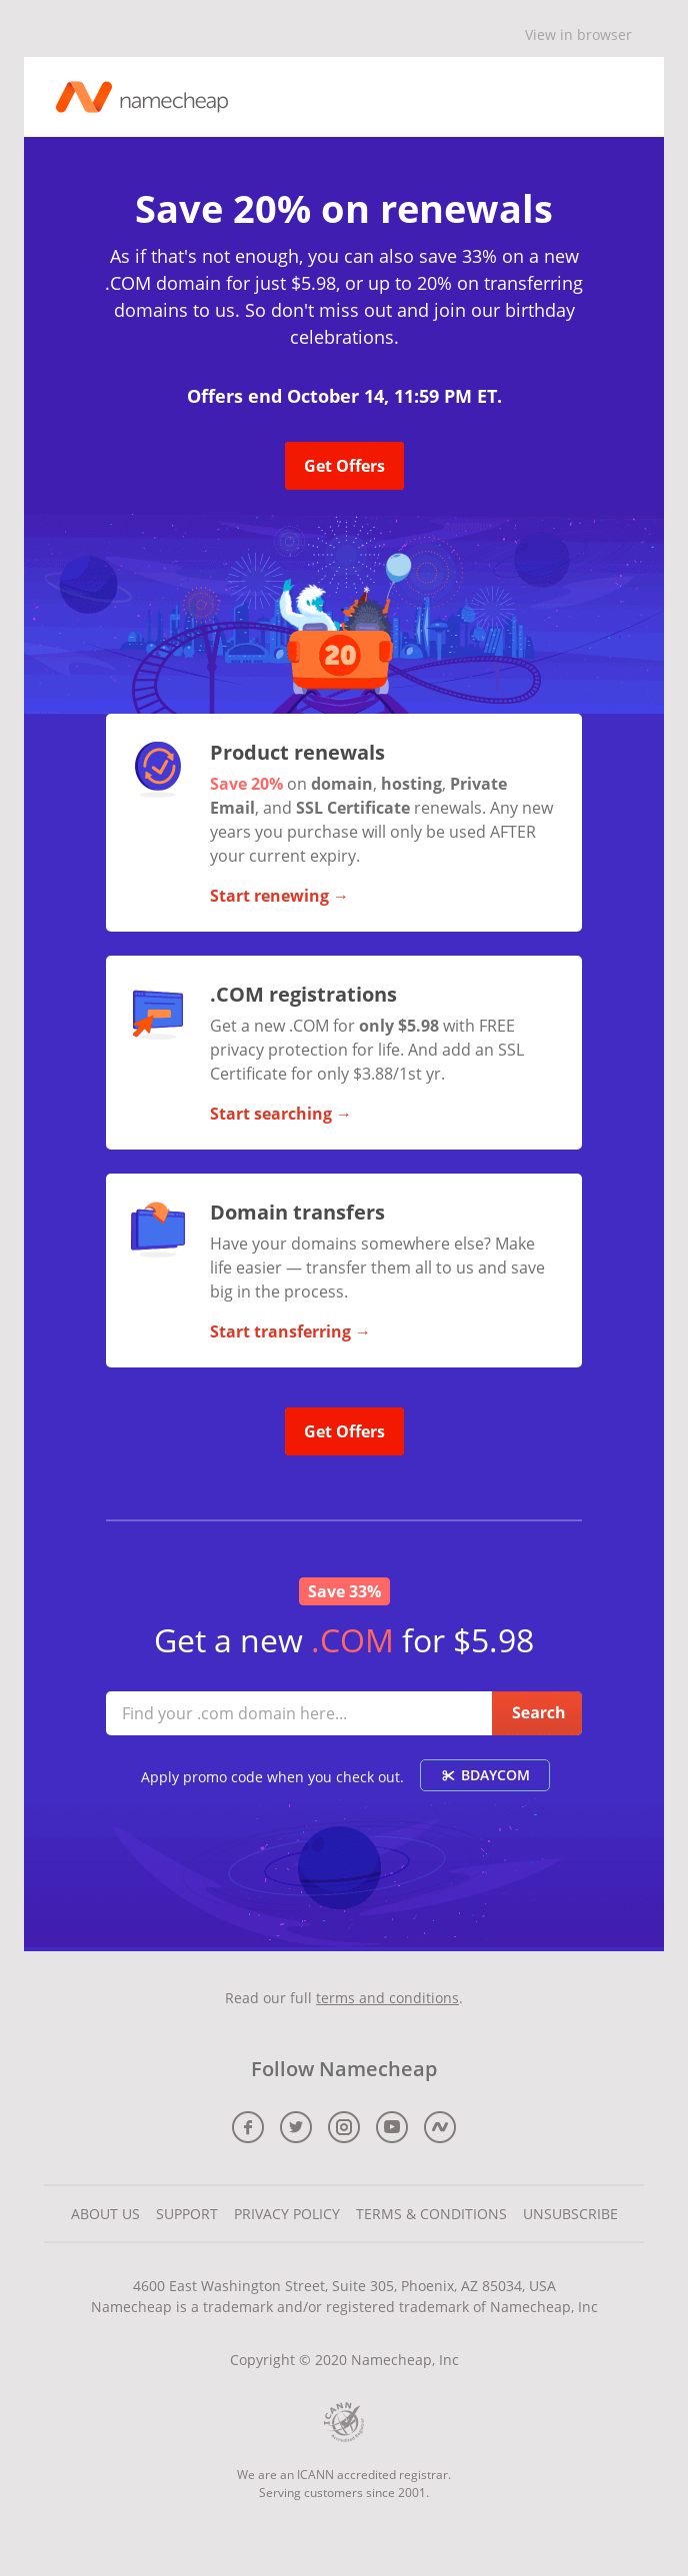 Namecheap renewal email campaign